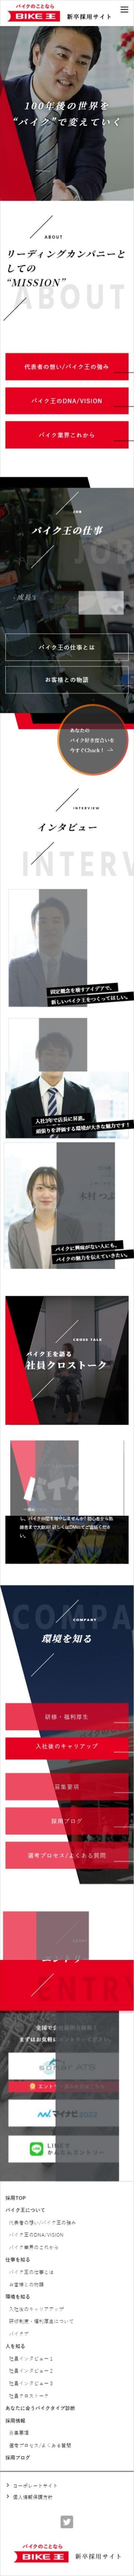 BIKE王 新卒採用サイト